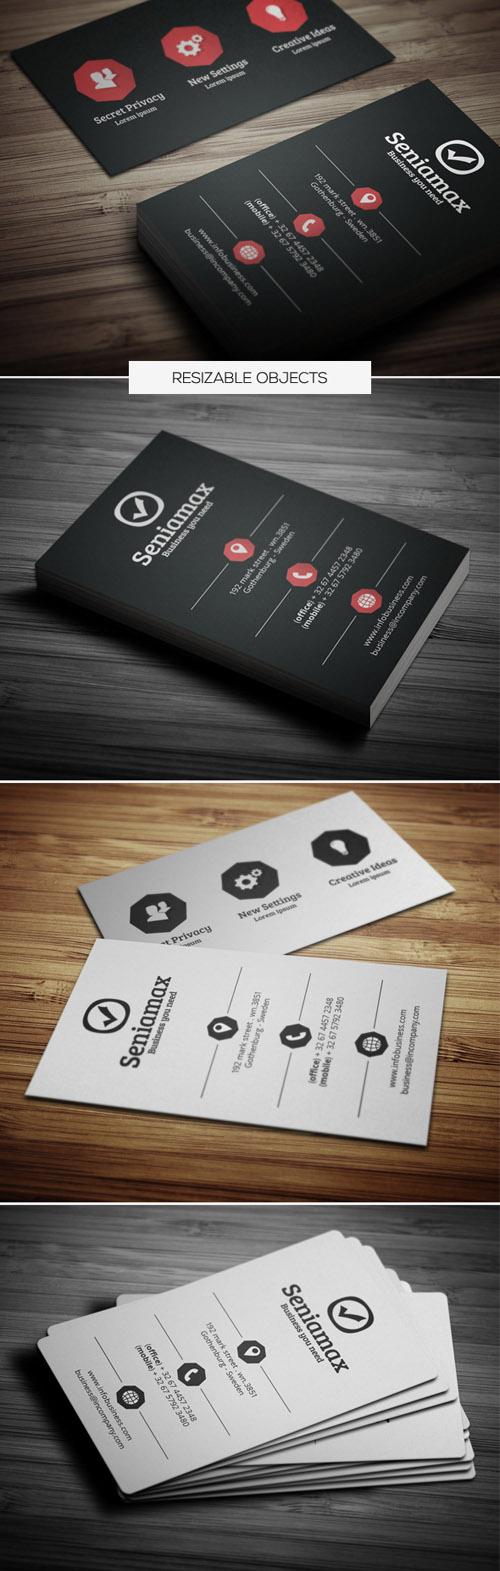 Stylish Business Cards Design-17